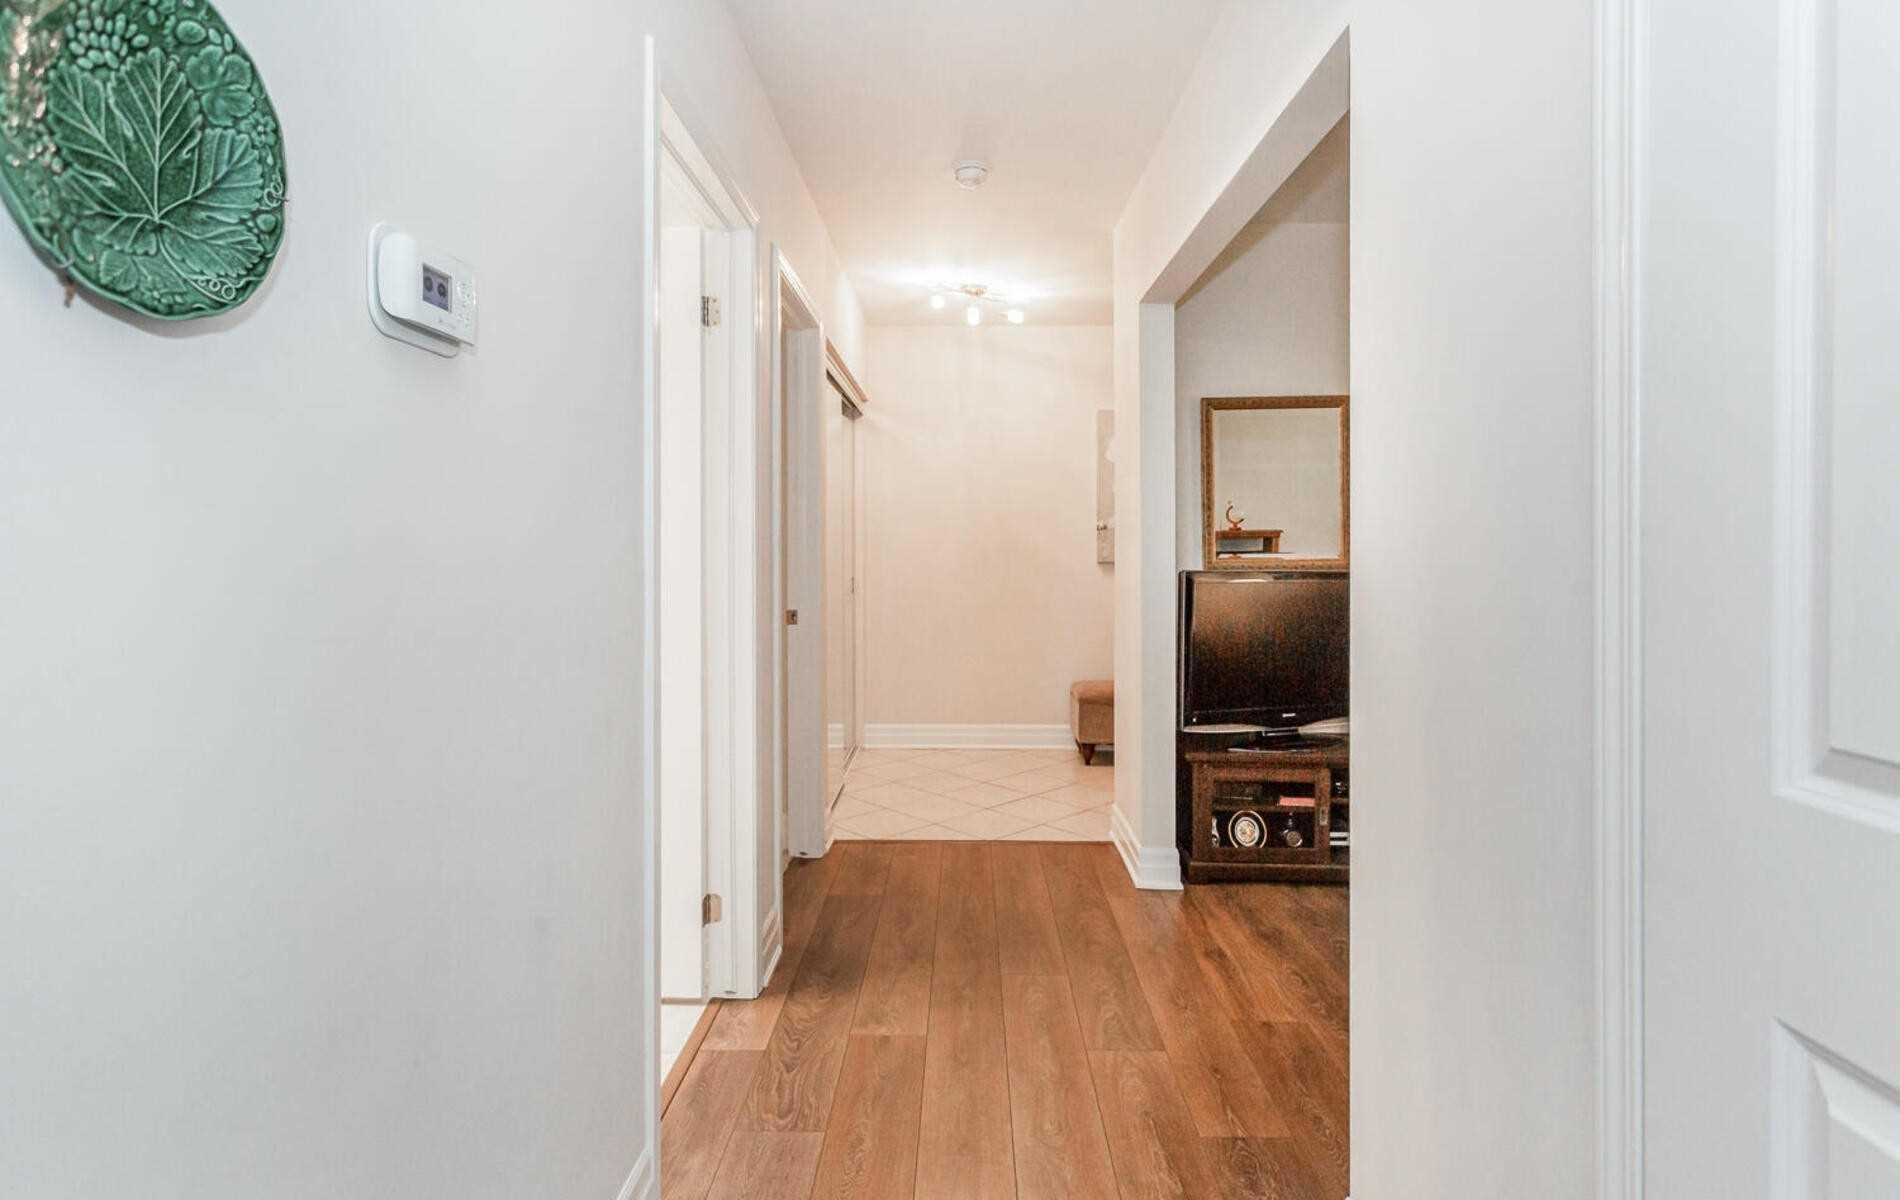 Condo Apt For Lease In Brampton , 2 Bedrooms Bedrooms, ,2 BathroomsBathrooms,Condo Apt,For Lease,309,Baycliffe